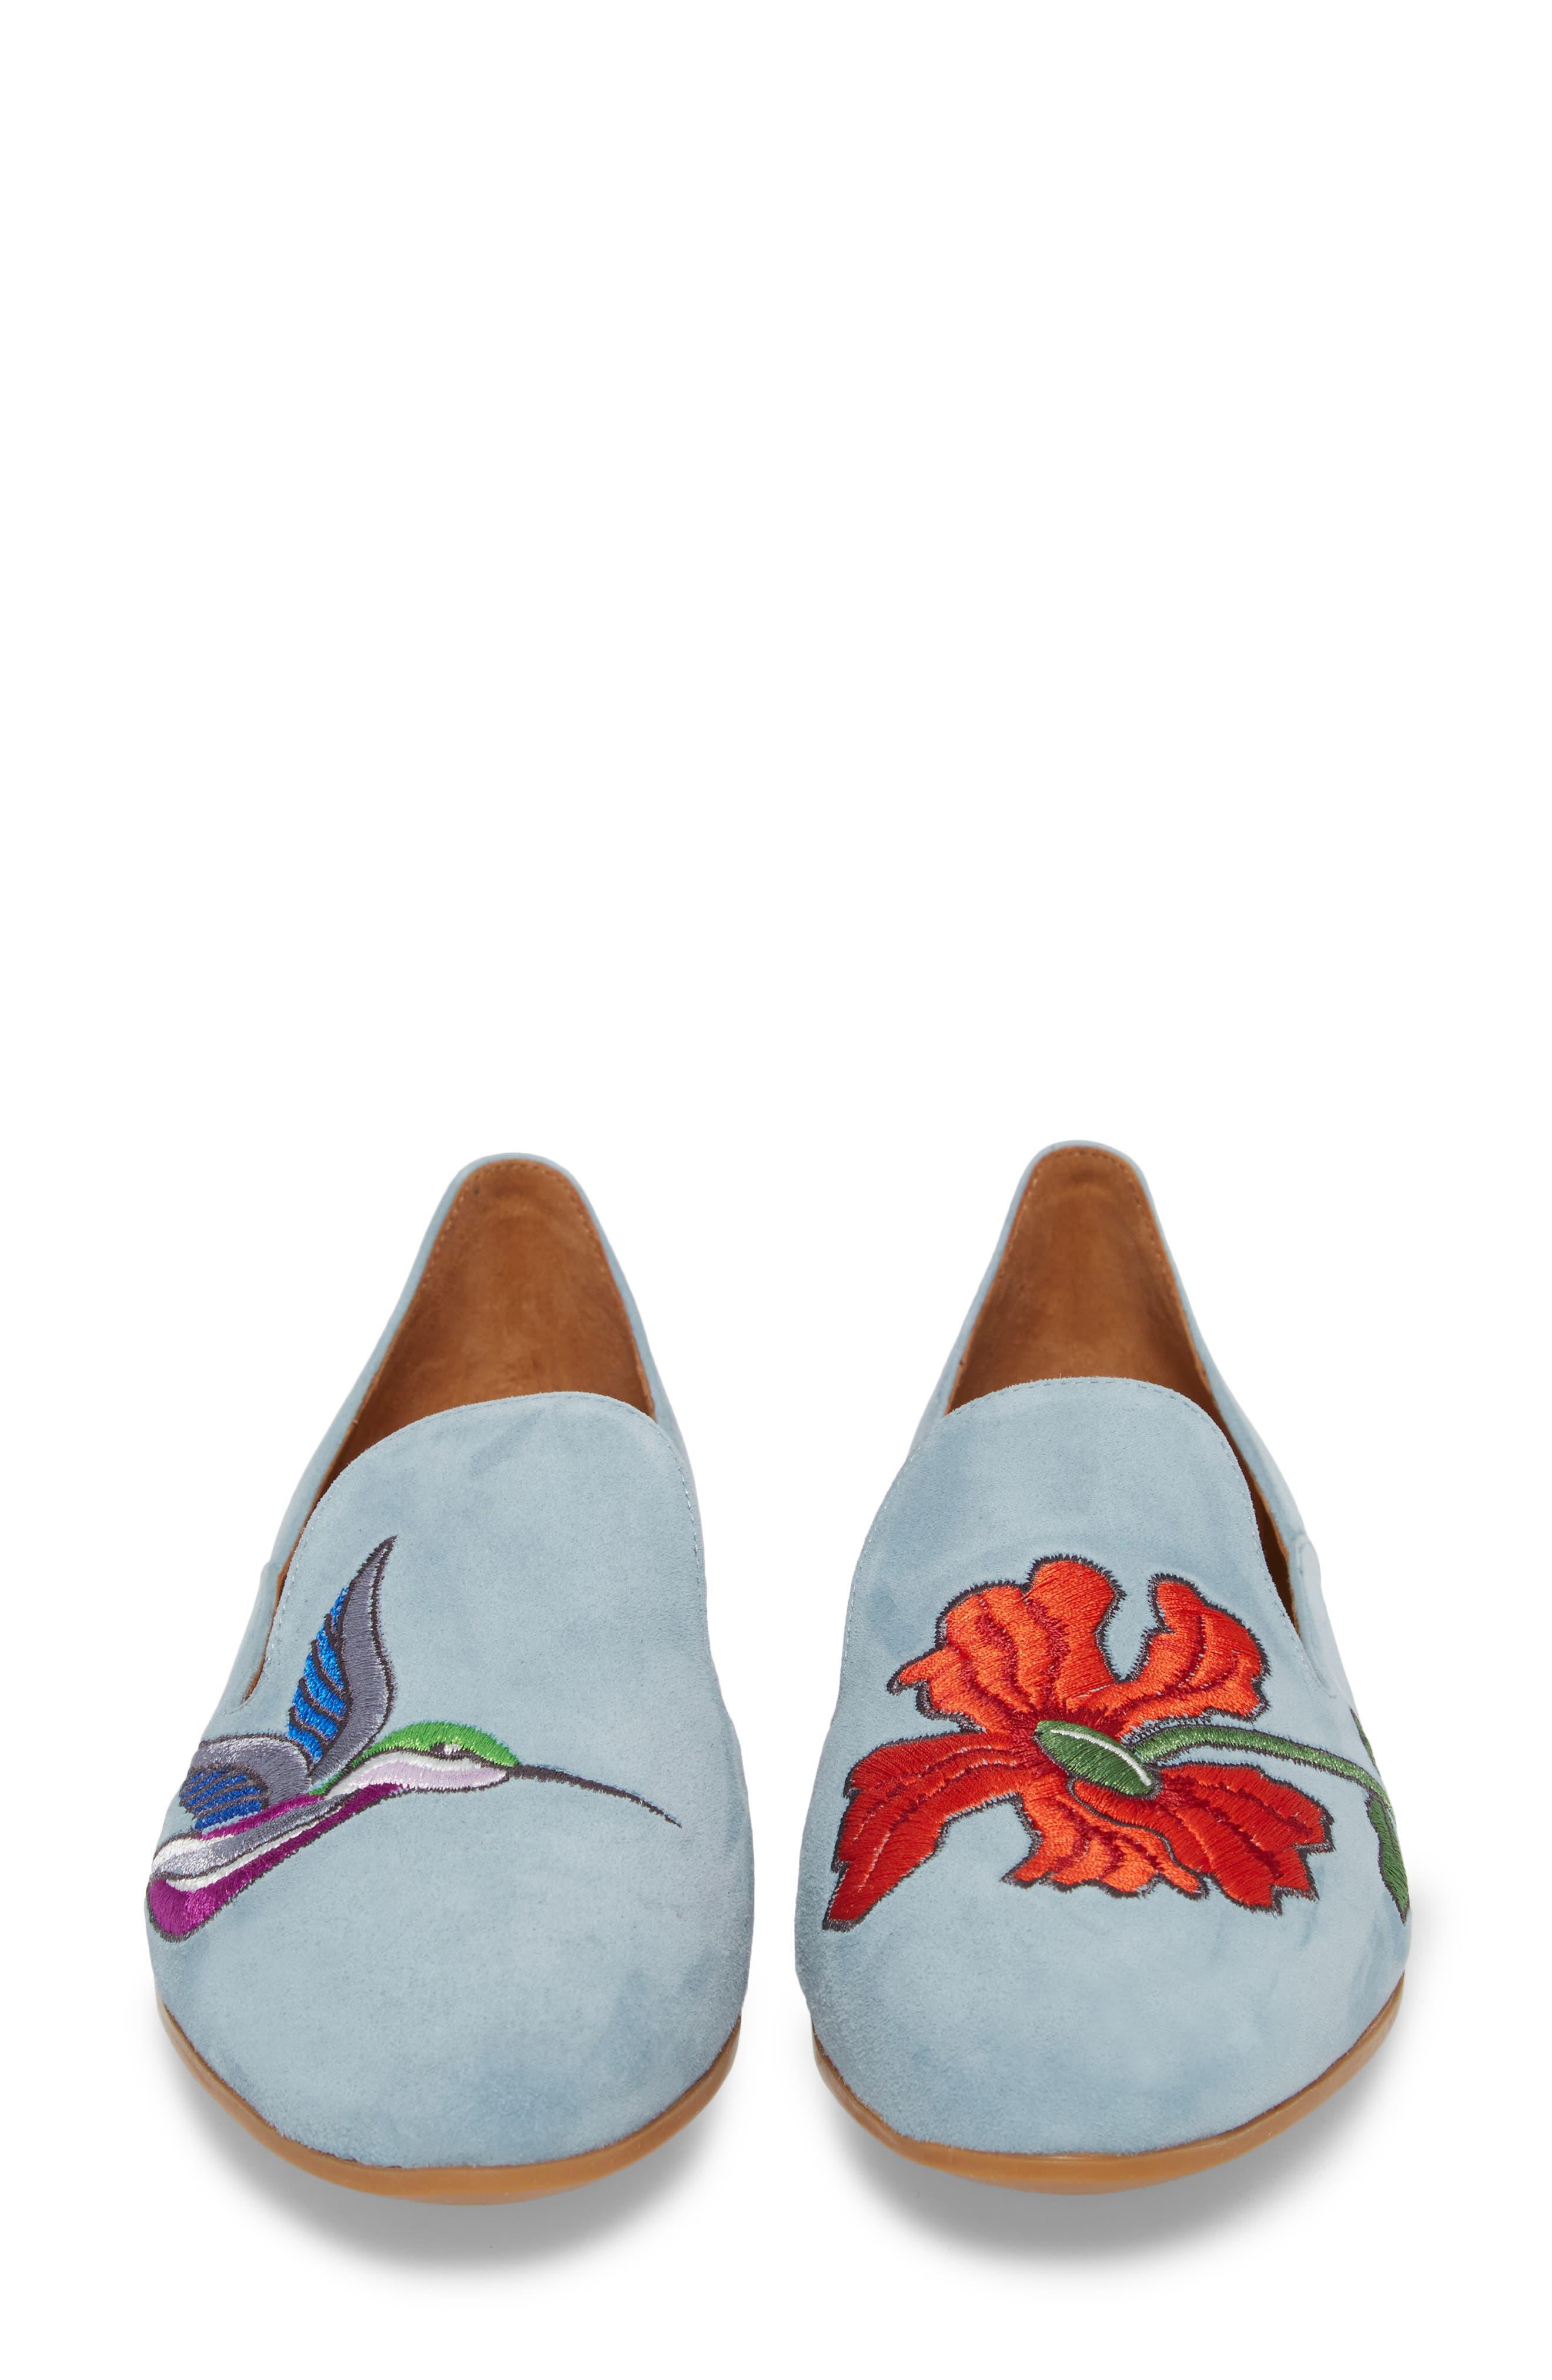 Emmaline Embroidered Loafer,                             Alternate thumbnail 15, color,